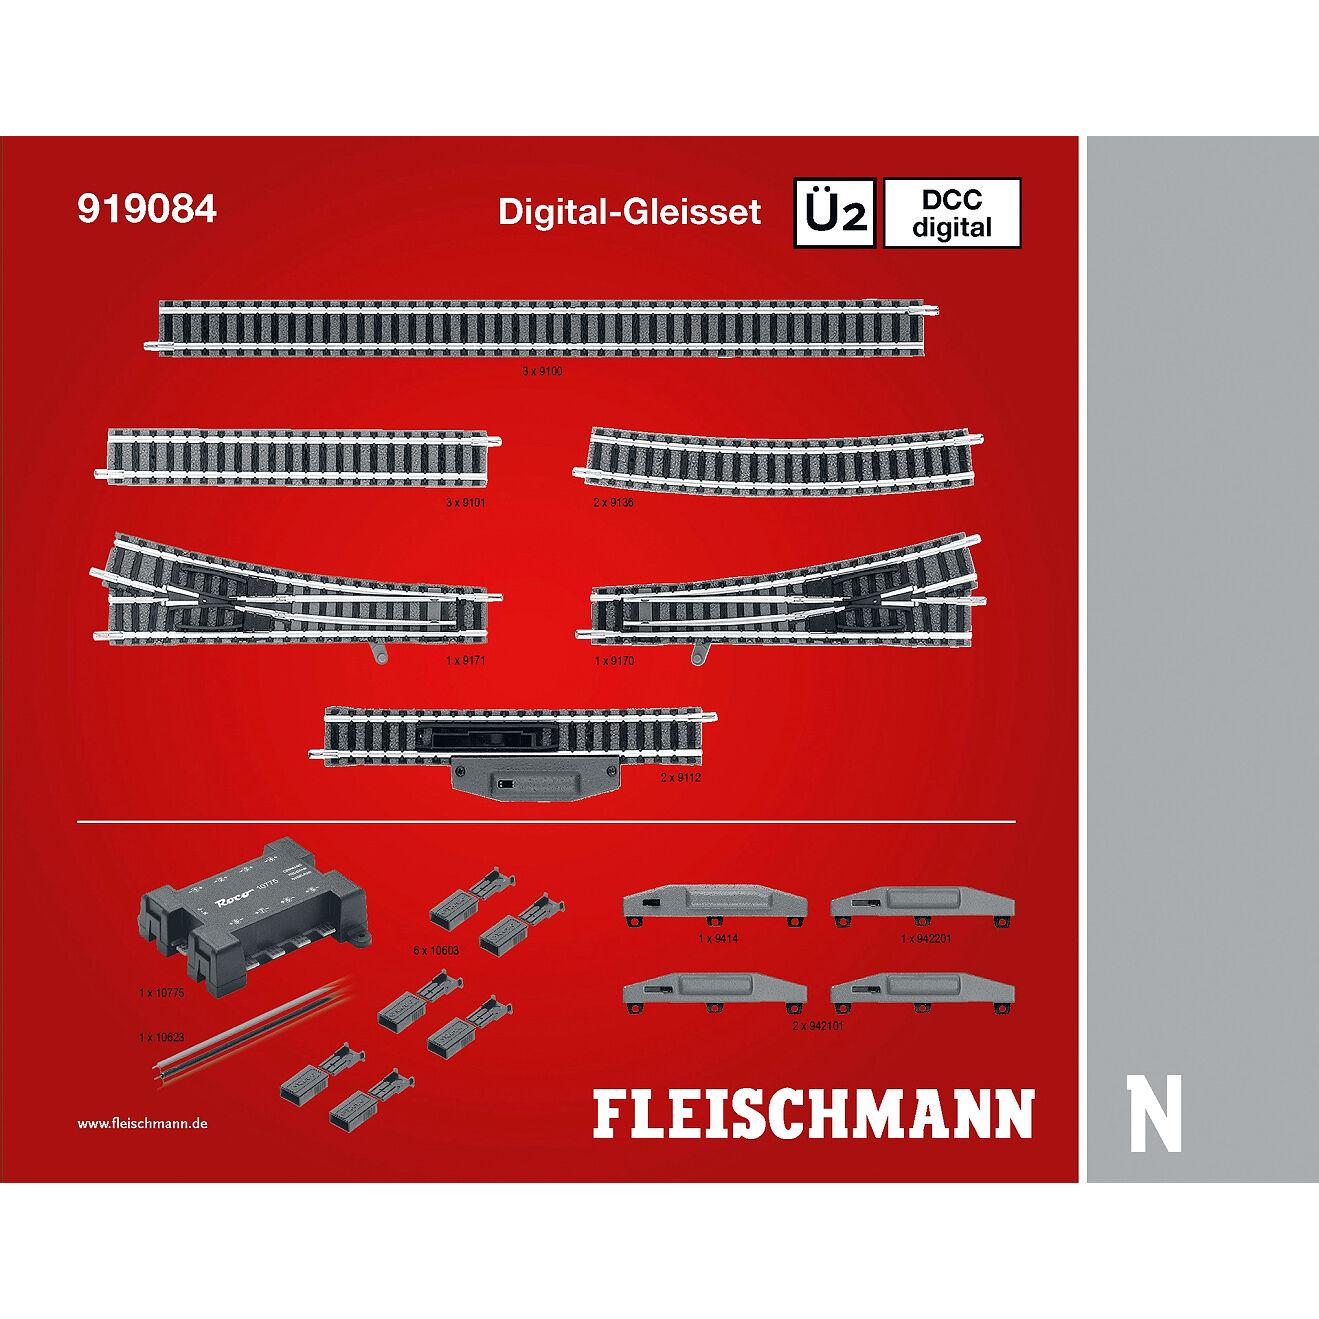 Fleischuomon 919084 N Profi-binario DCC DIGITAL-gleisset ü2 + + + + NUOVO & OVP + + a455de